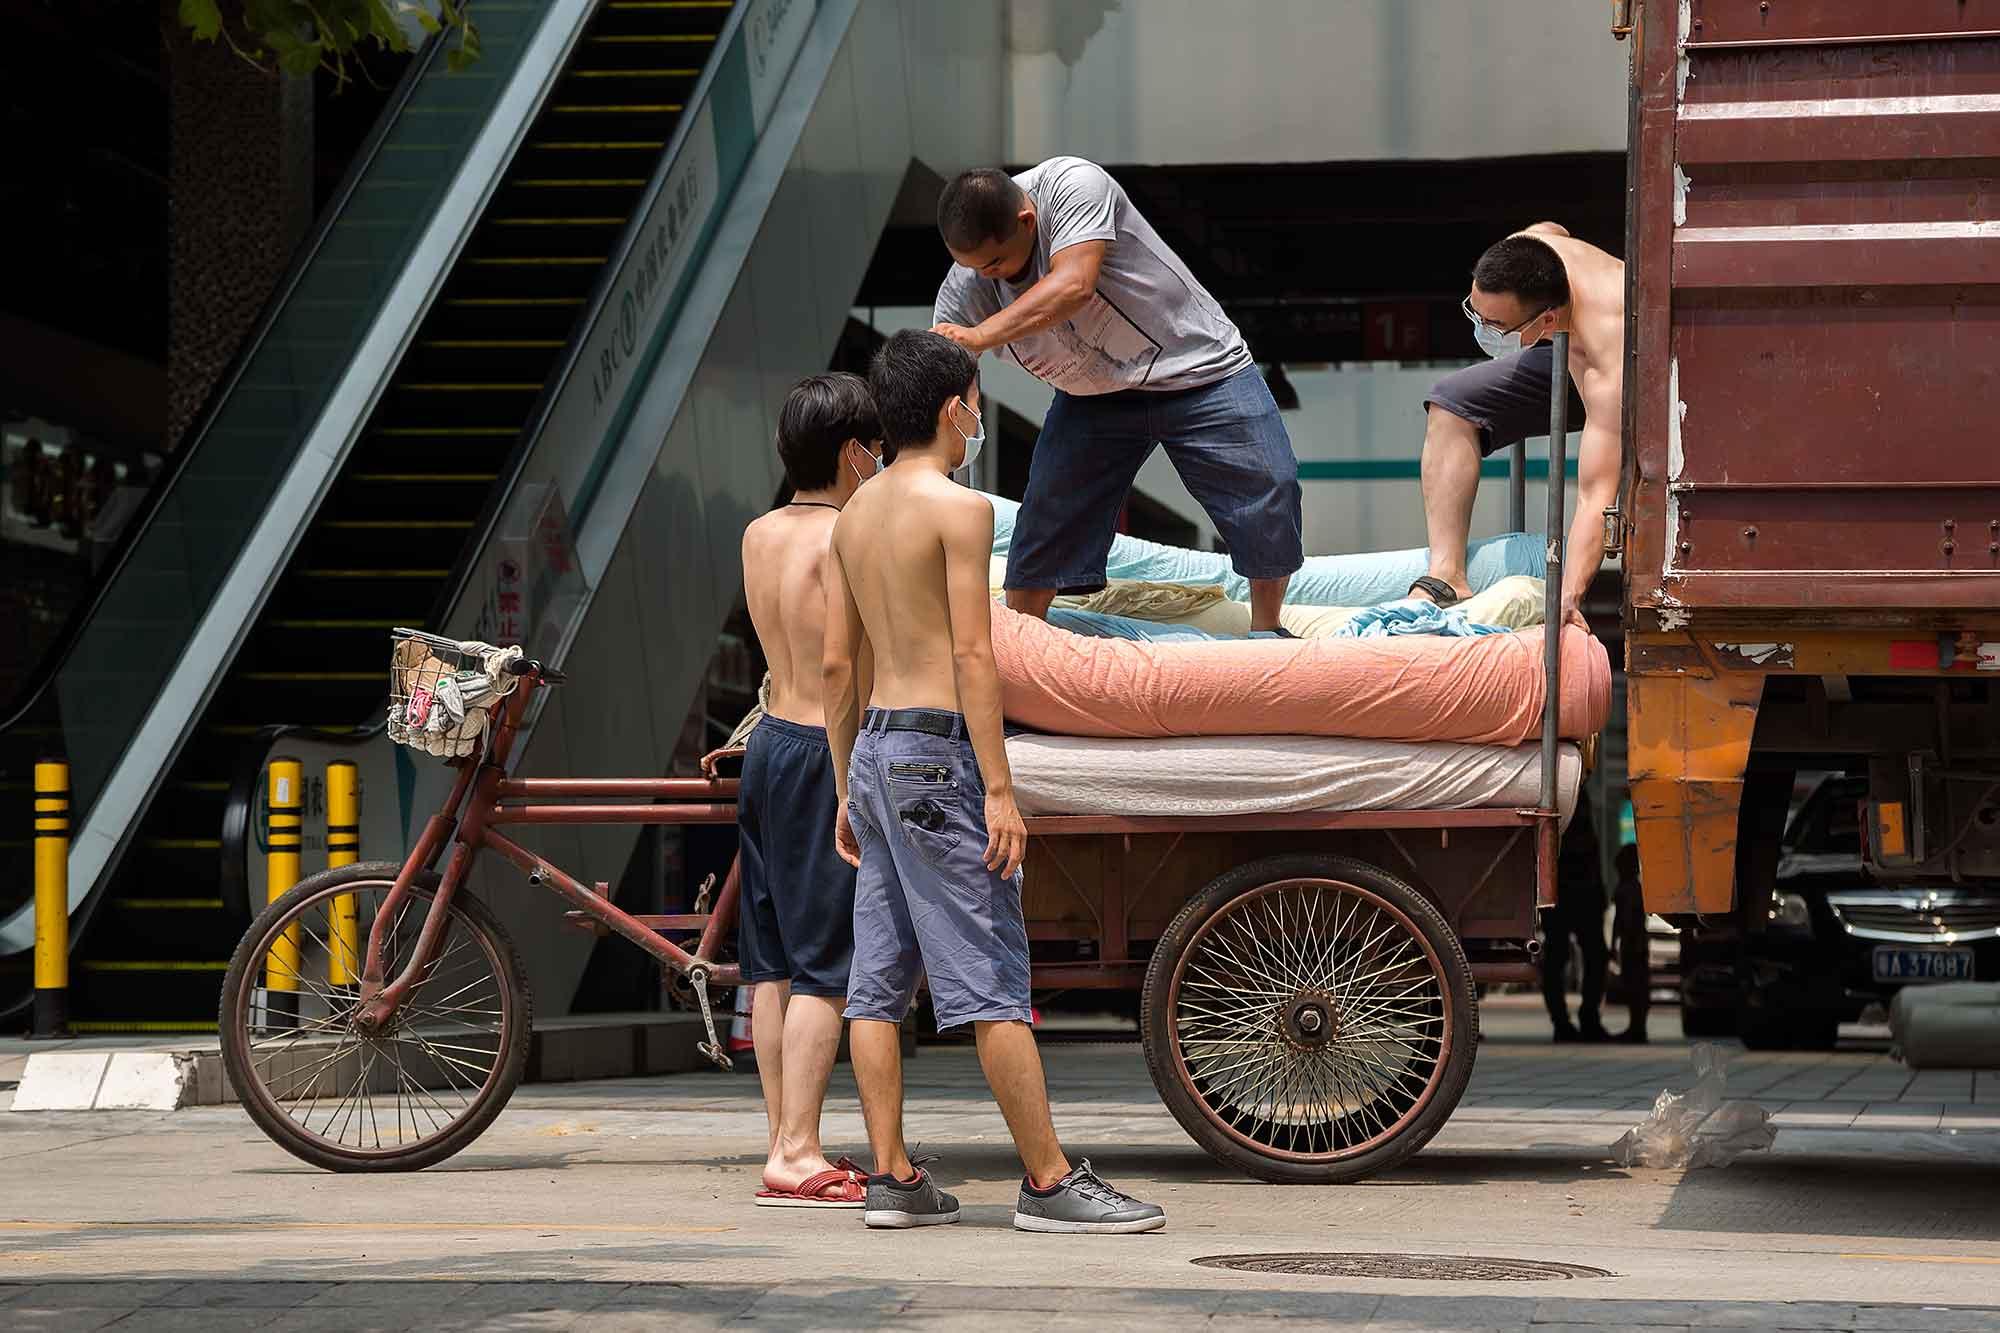 Men unloading a truck in Beijing. © Ulli Maier & Nisa Maier